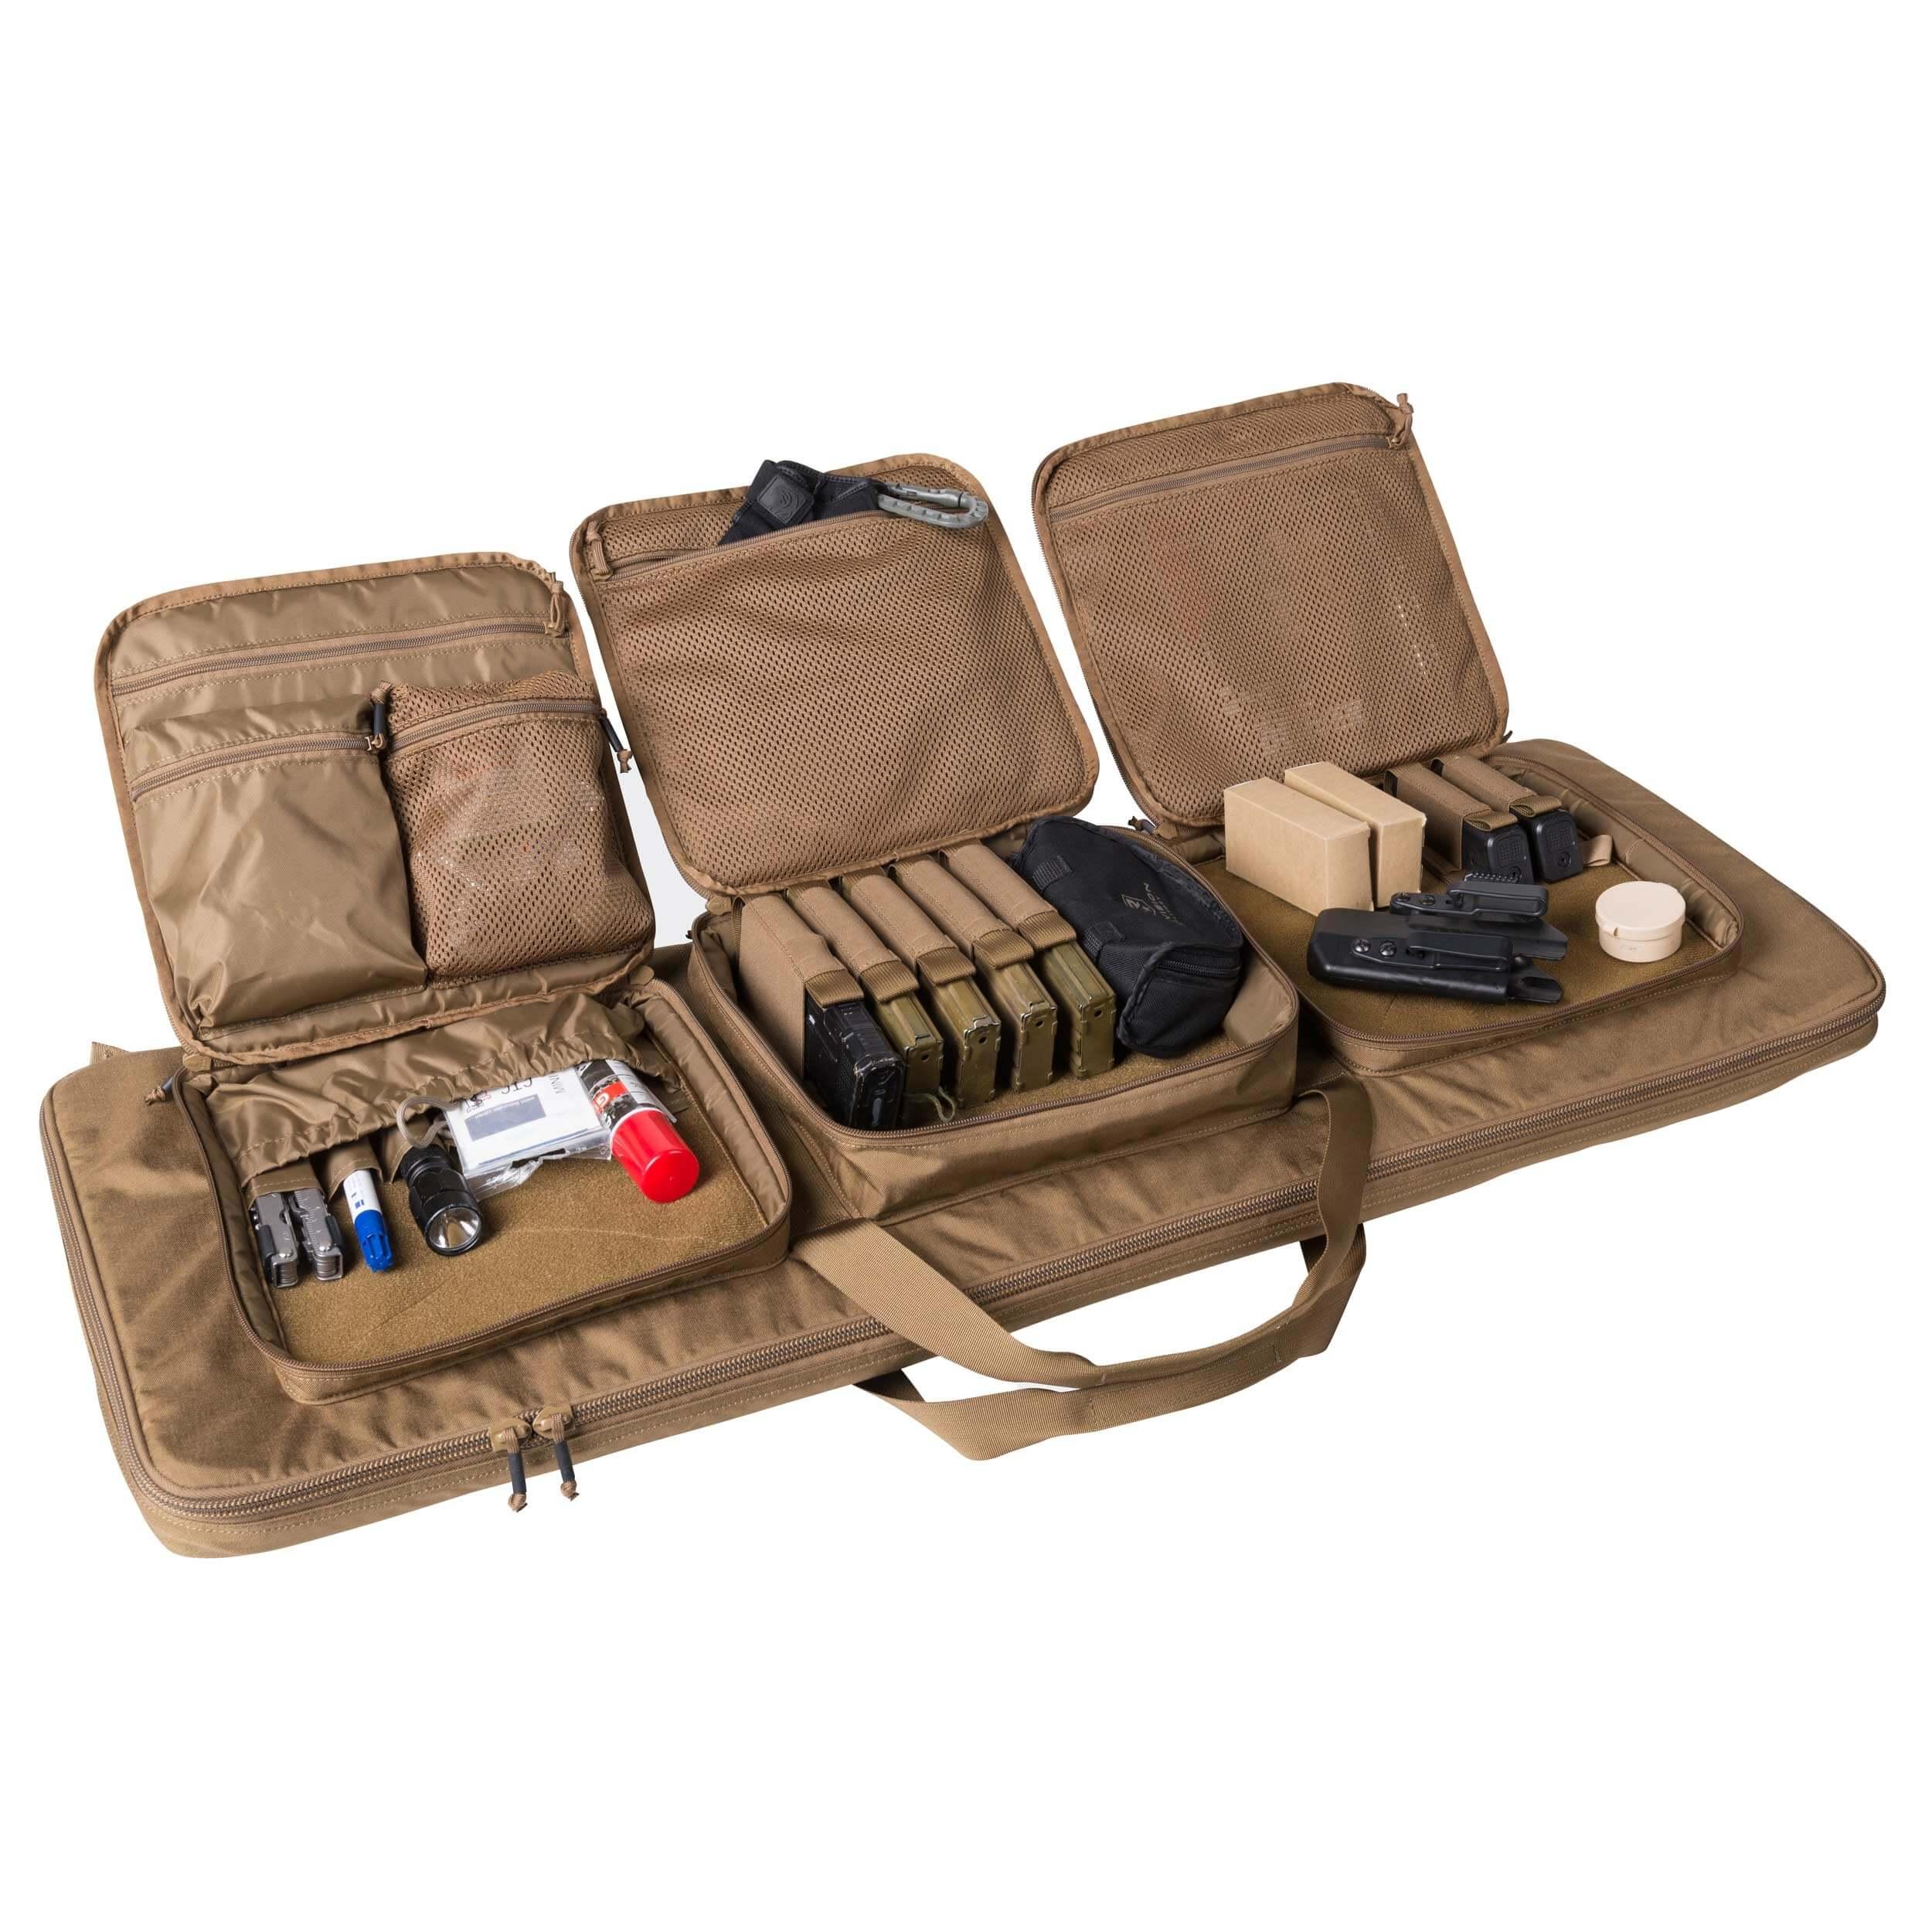 Helikon-Tex Double Upper Rifle Bag 18 Coyote